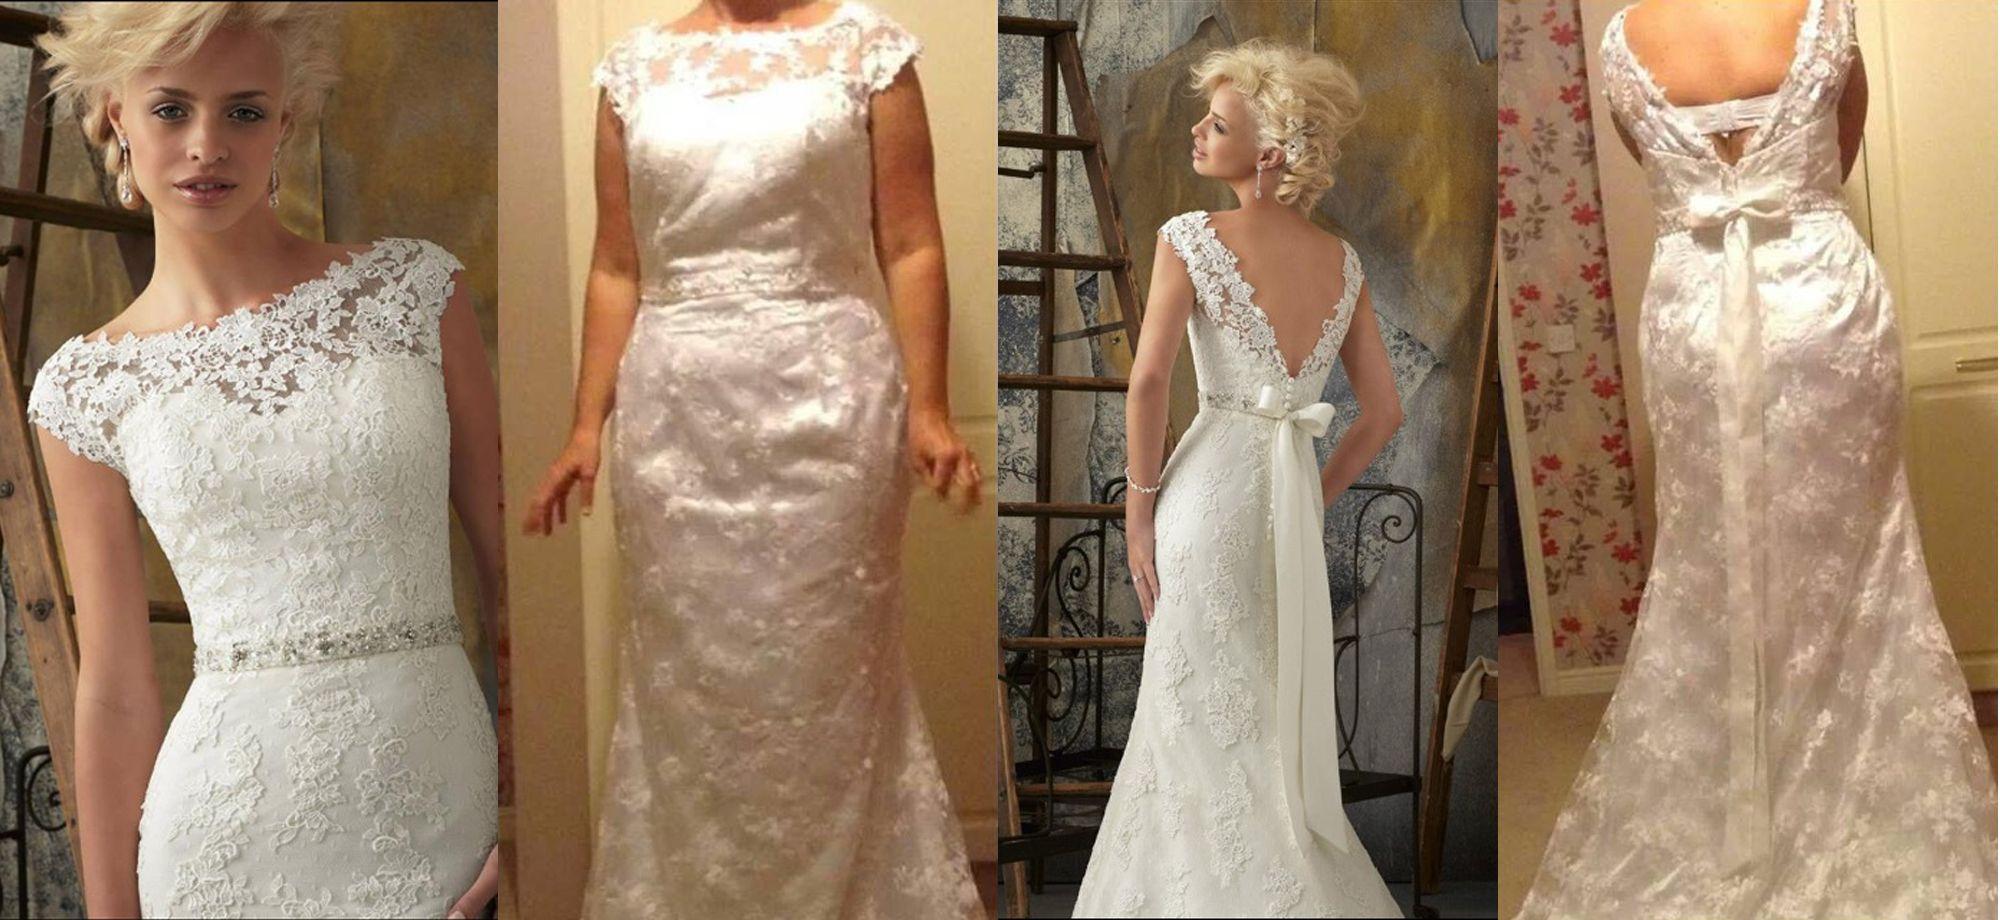 Warning over fake online #wedding #dresses | Buyer Beware, the ...